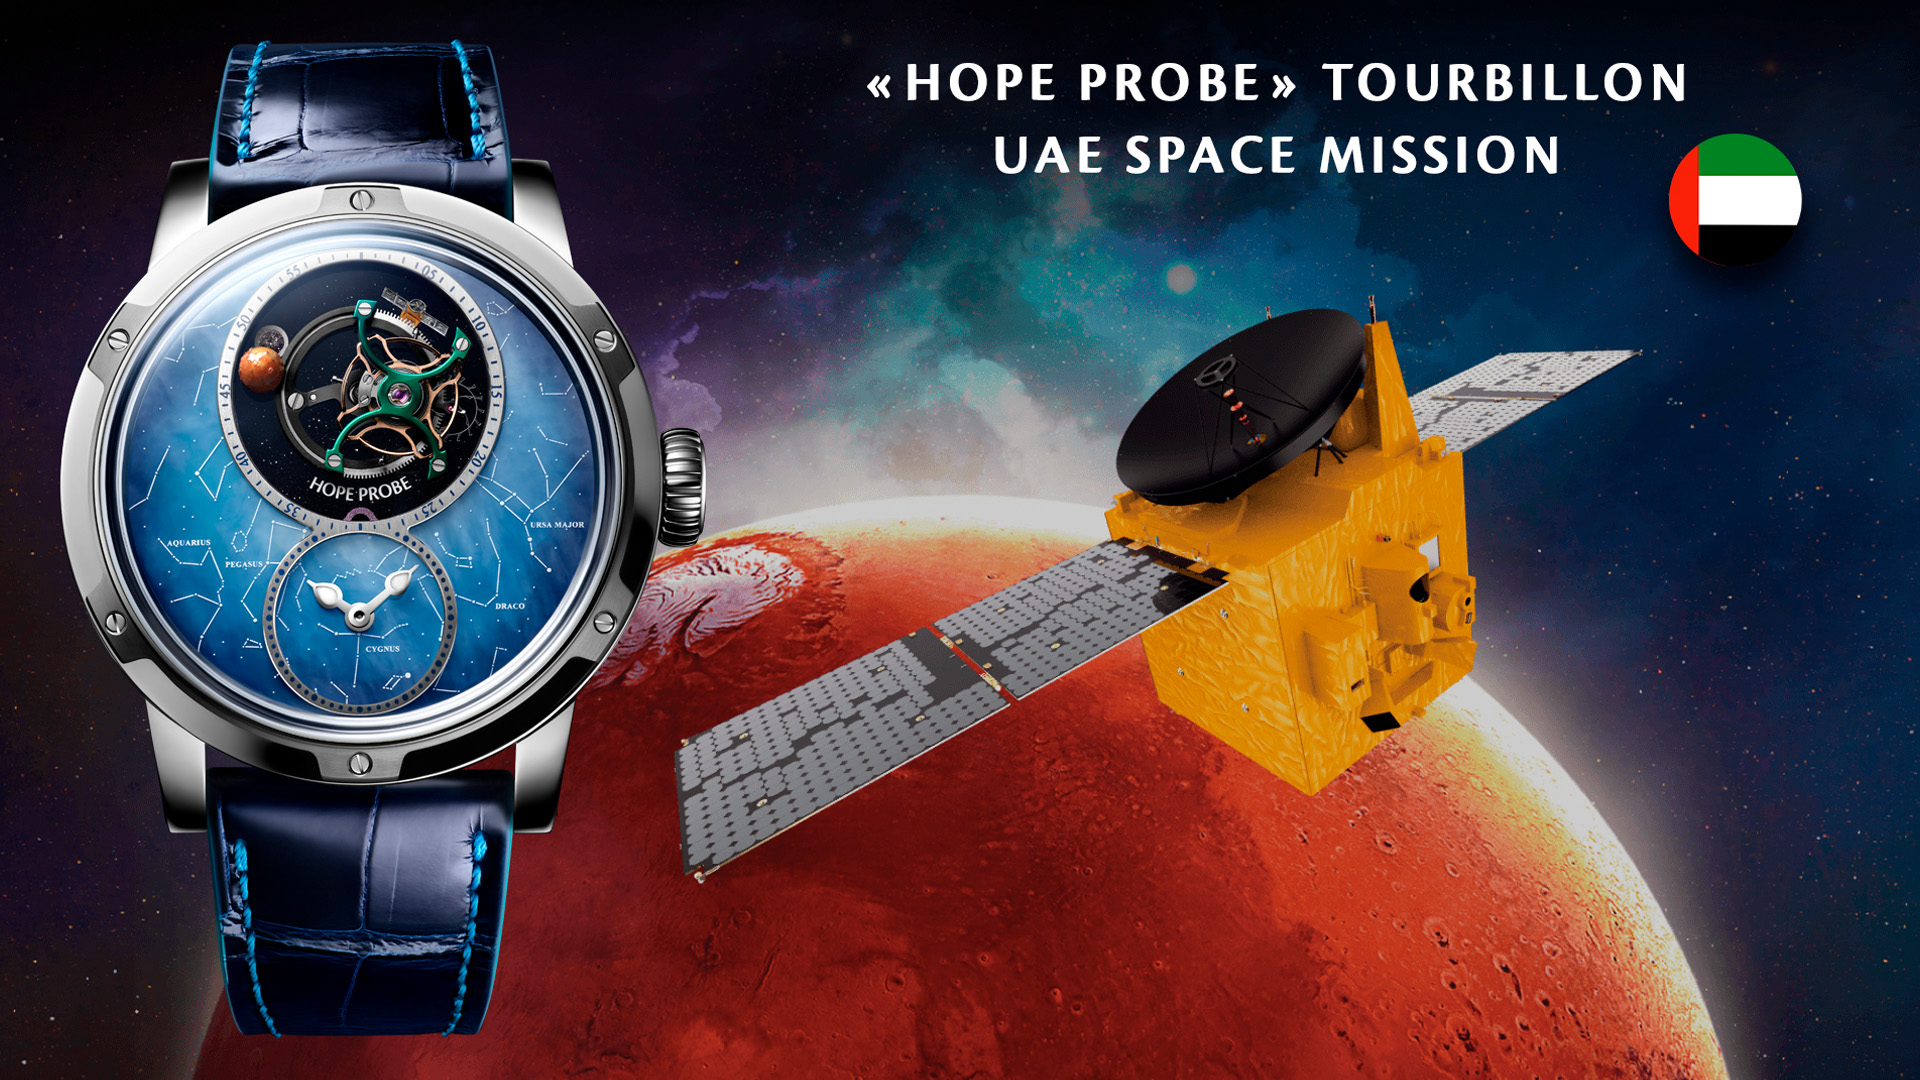 Louis Moinet makes unique timepiece dedicated to UAE space mission